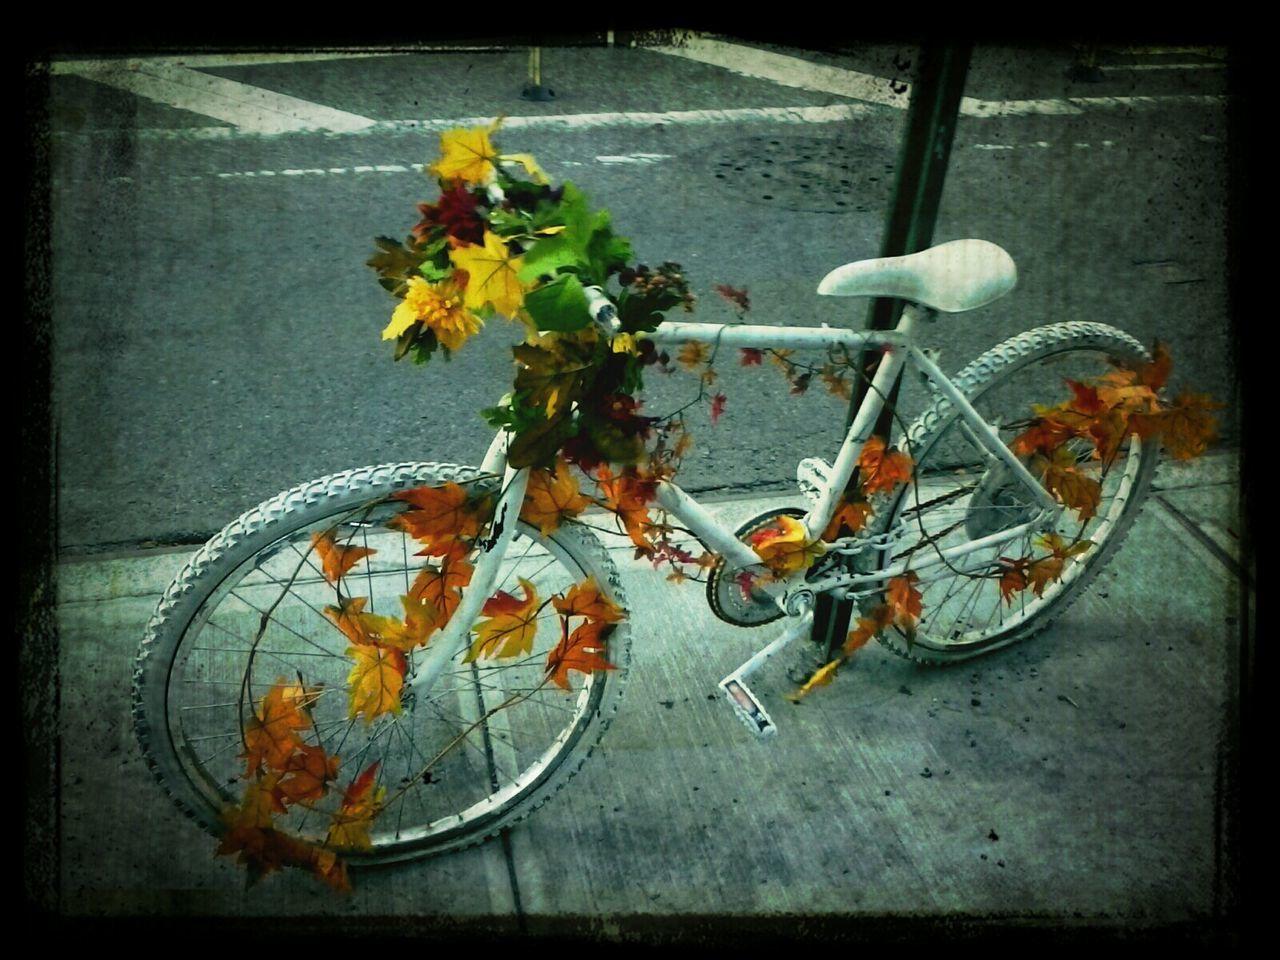 Bicycle Ghost Bike Chelsea New York